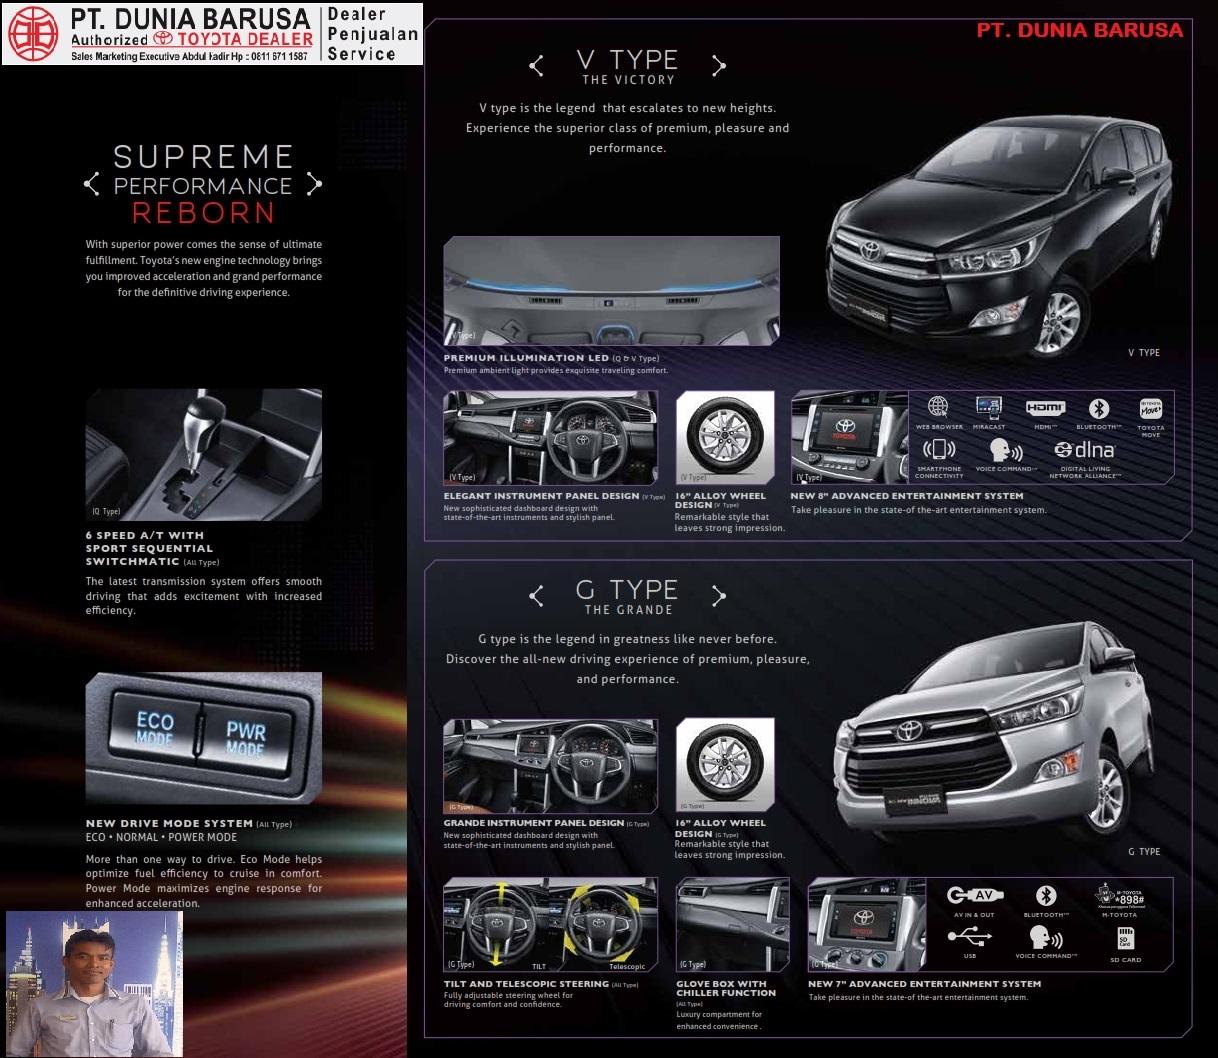 Harga All New Kijang Innova 2016 Type G The Corolla Altis  Mobil Toyota Aceh